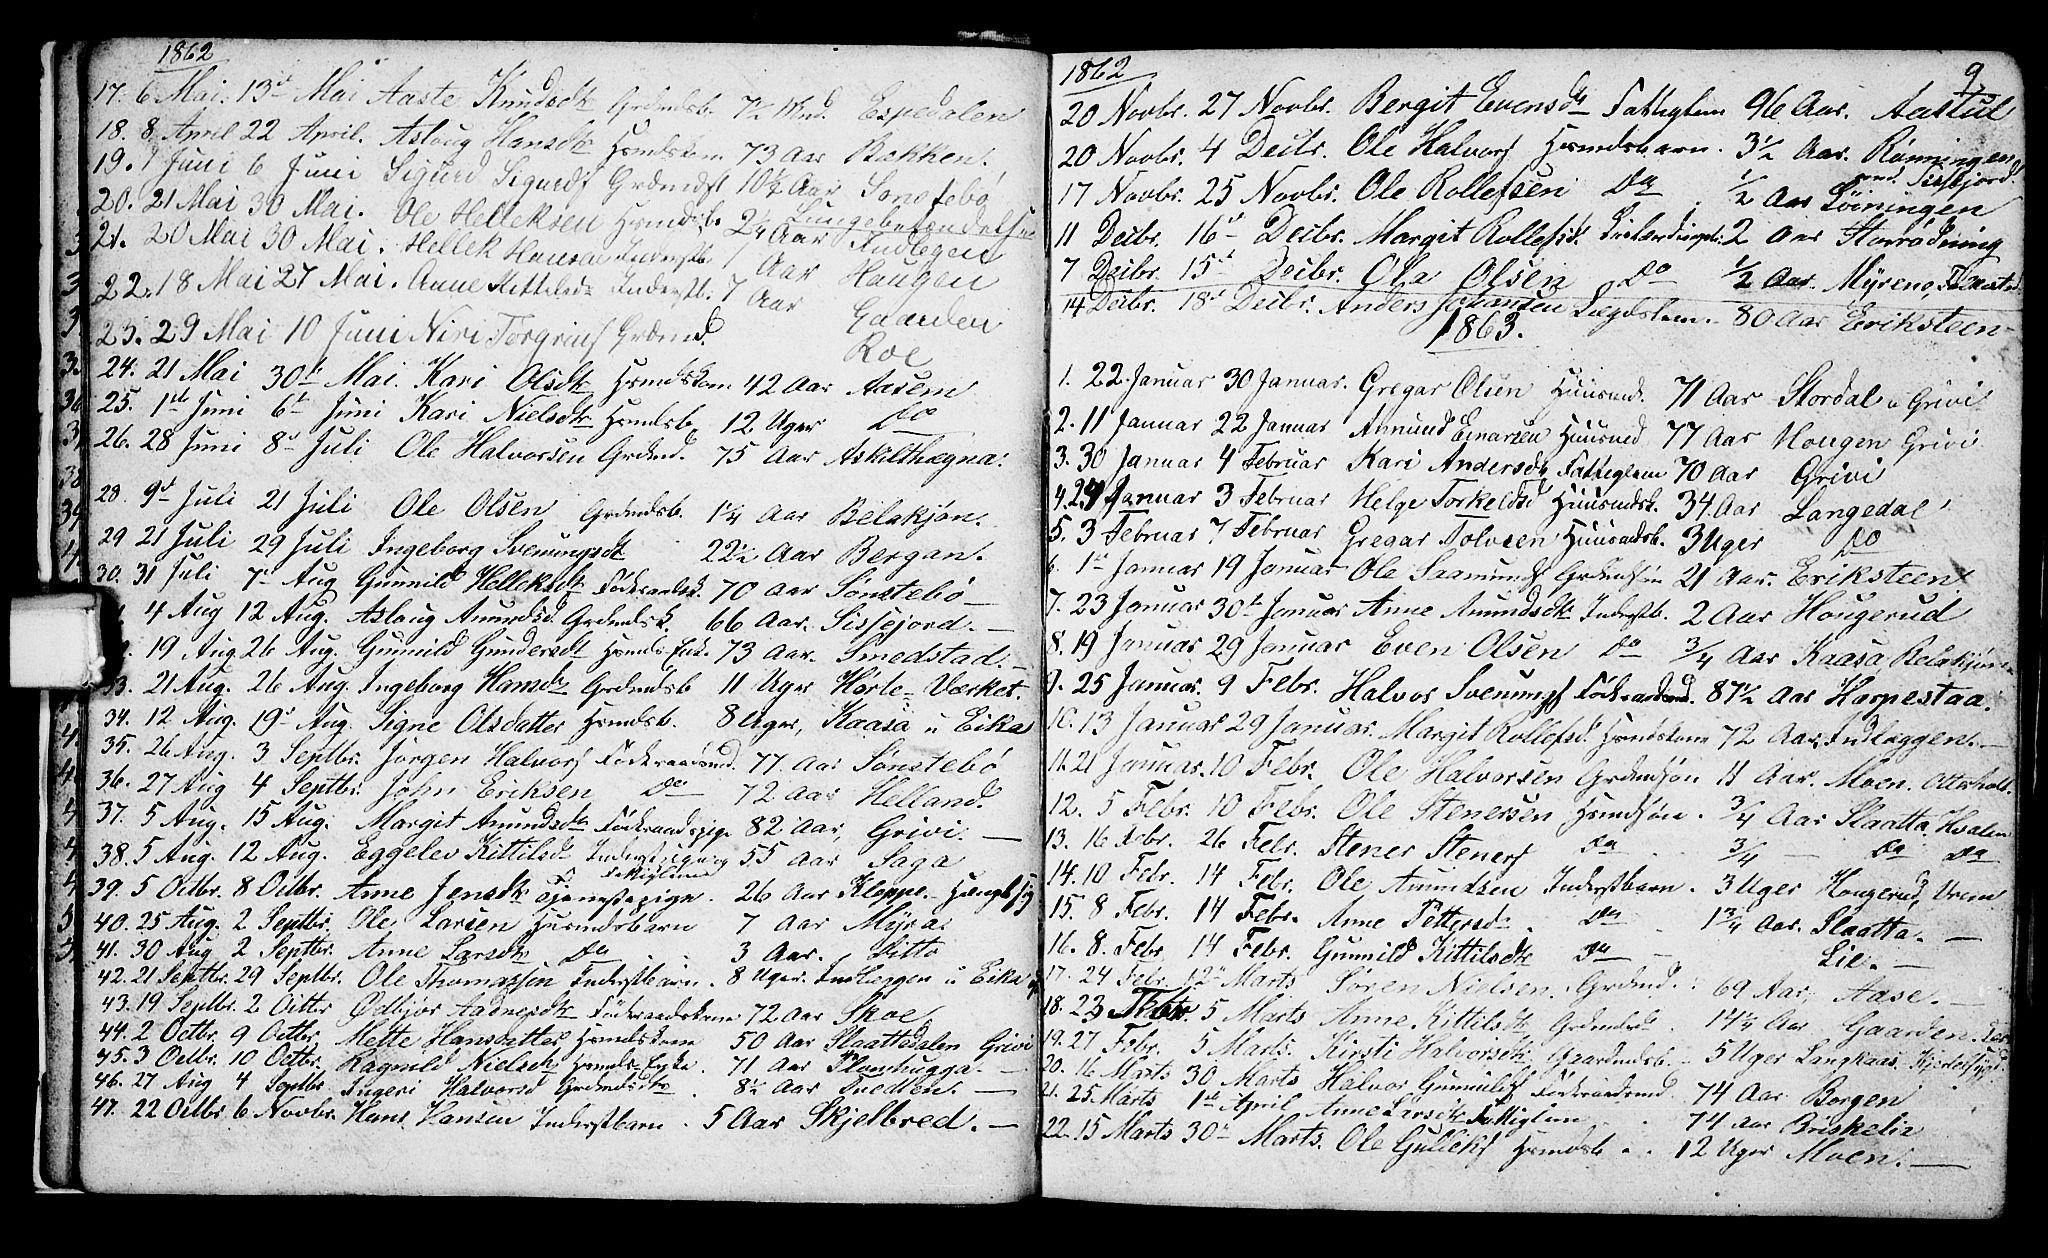 SAKO, Bø kirkebøker, G/Ga/L0002: Klokkerbok nr. 2, 1853-1866, s. 9